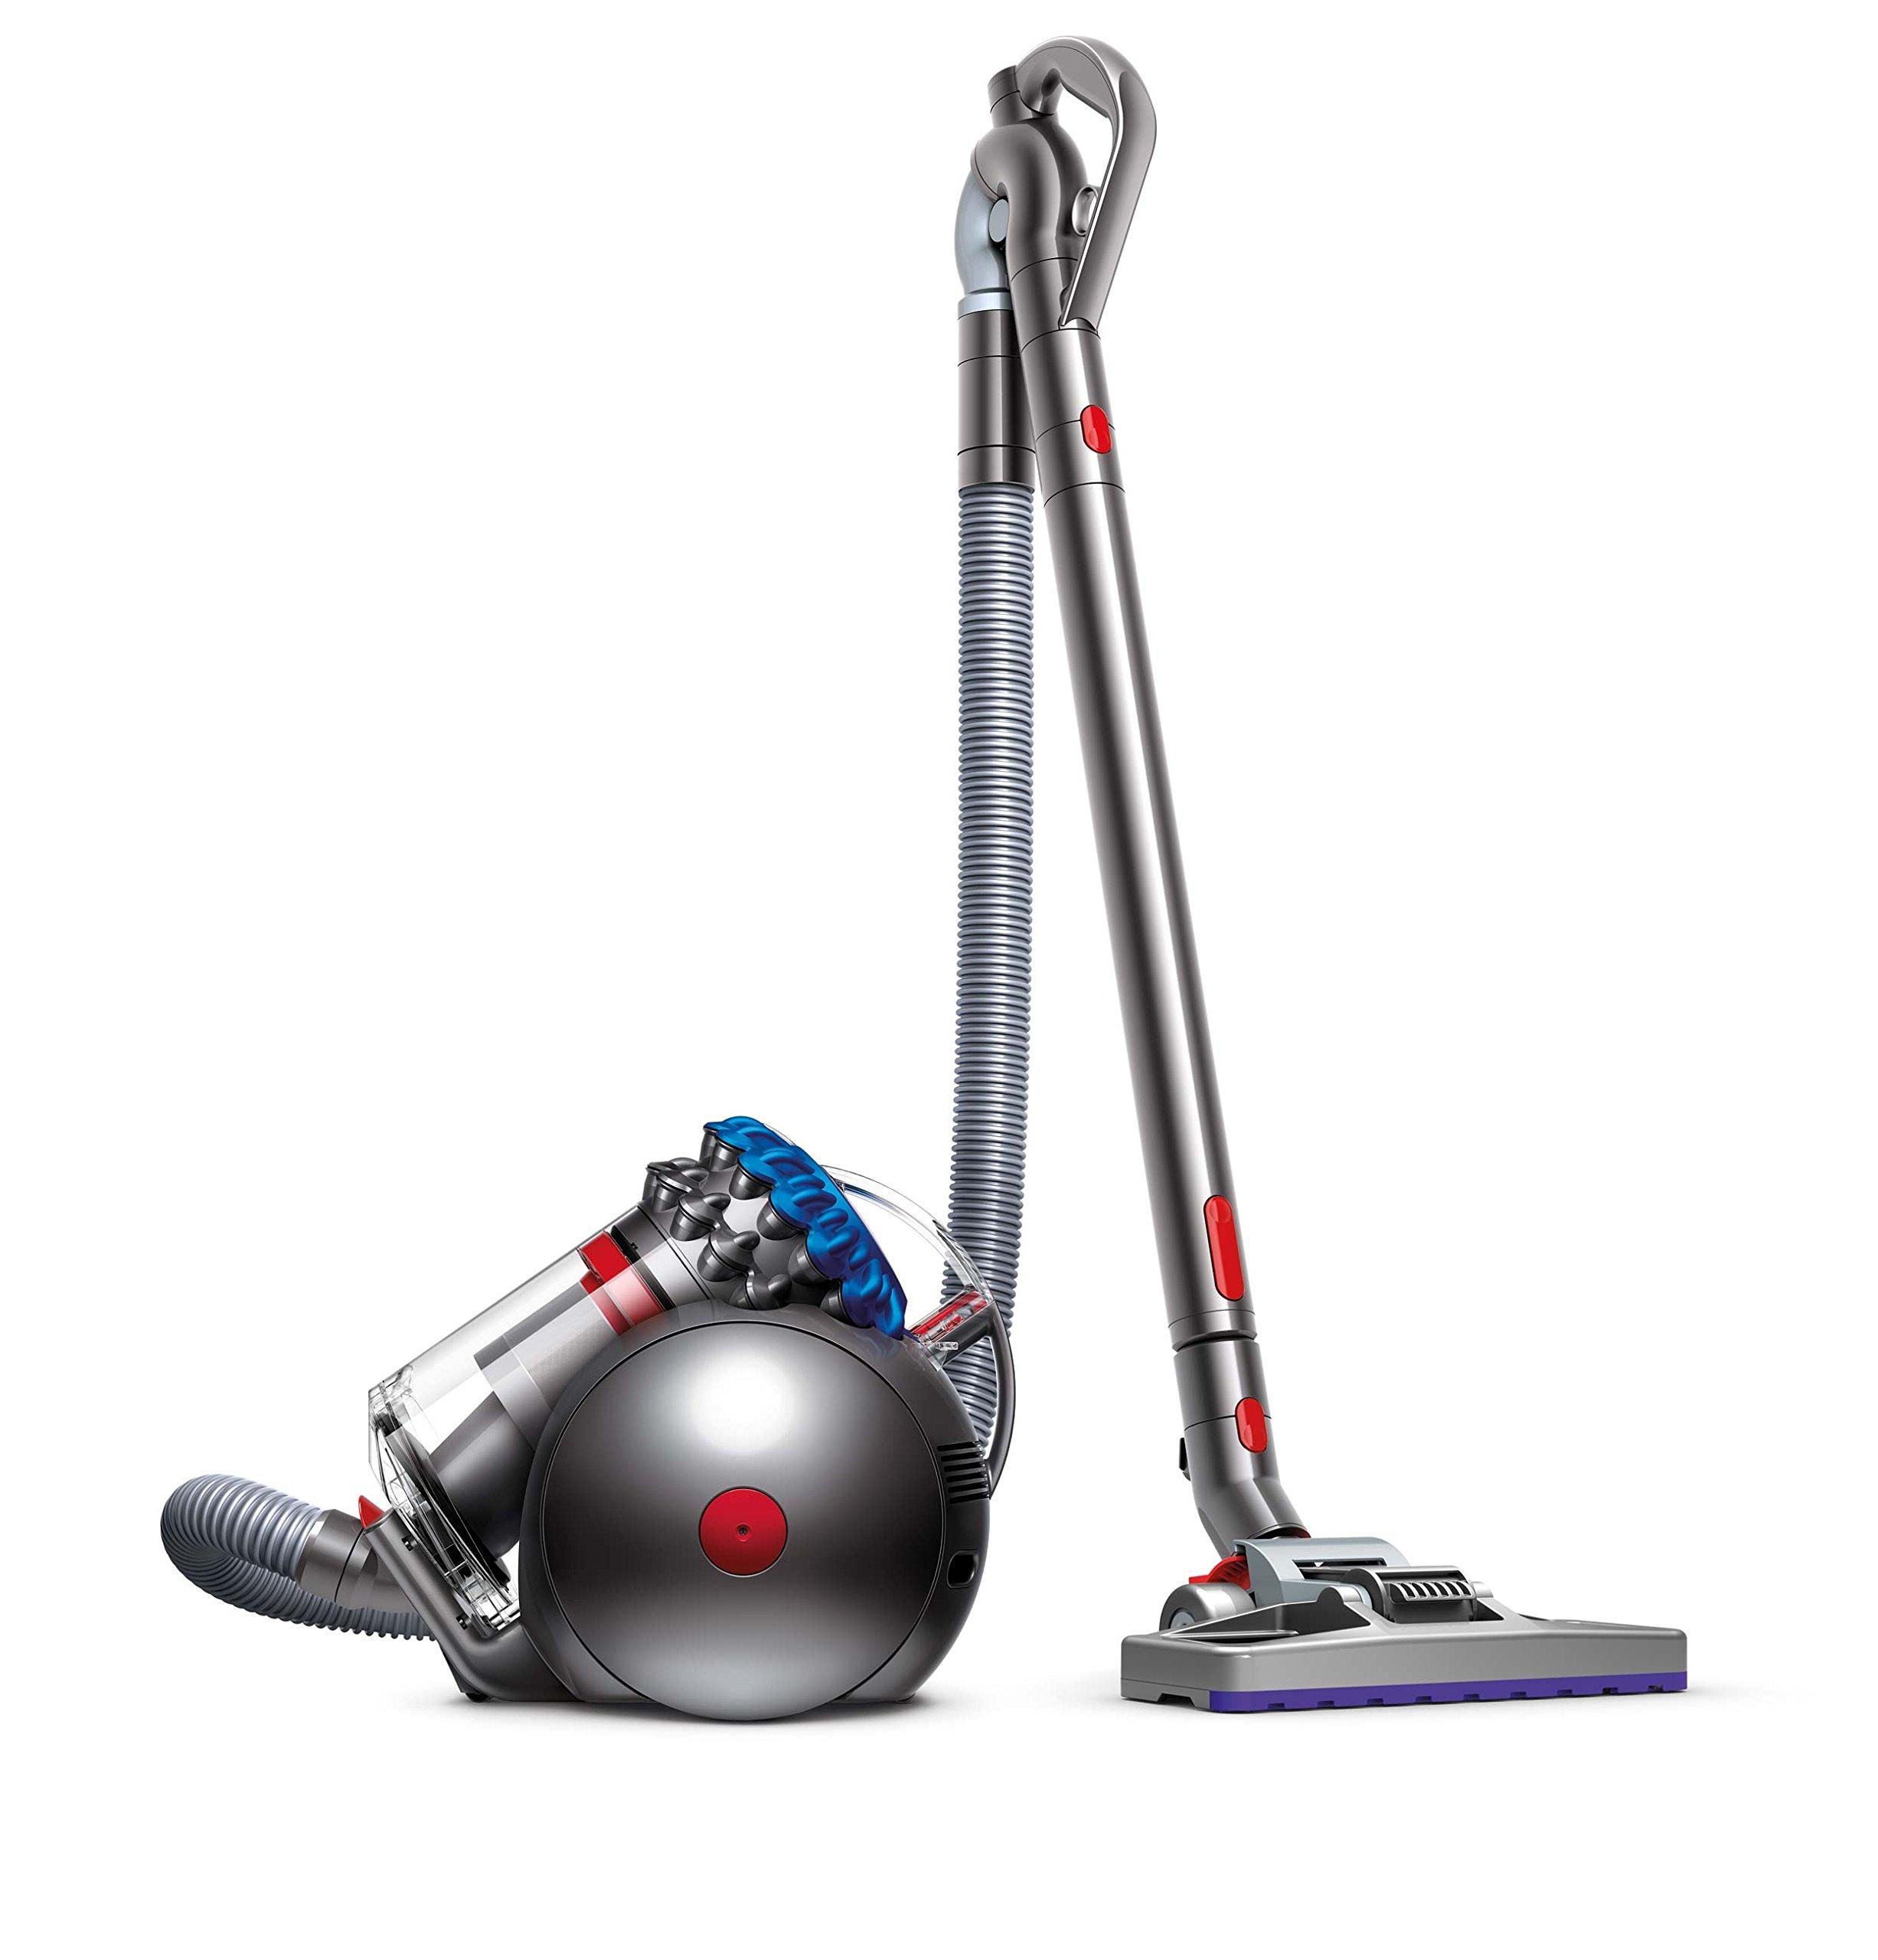 Dyson Big Ball Stubborn - Aspiradora (Aspiradora cilíndrica, Secar, Sin bolsa, 1,6 L, Ciclónico, 85 dB): Amazon.es: Hogar